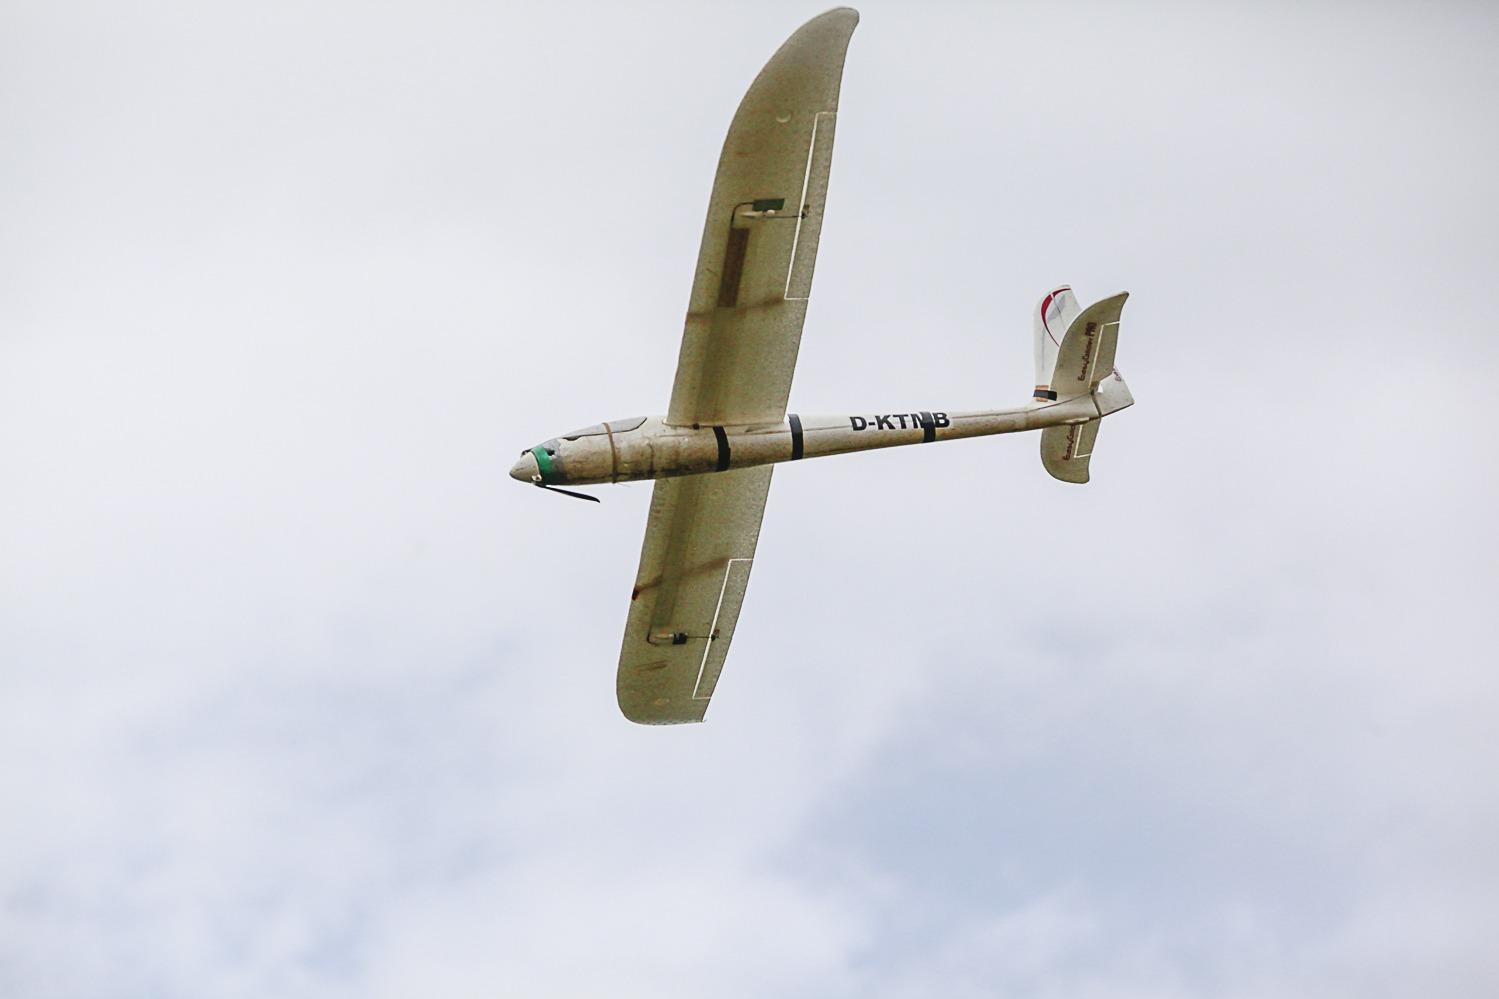 MG_1033